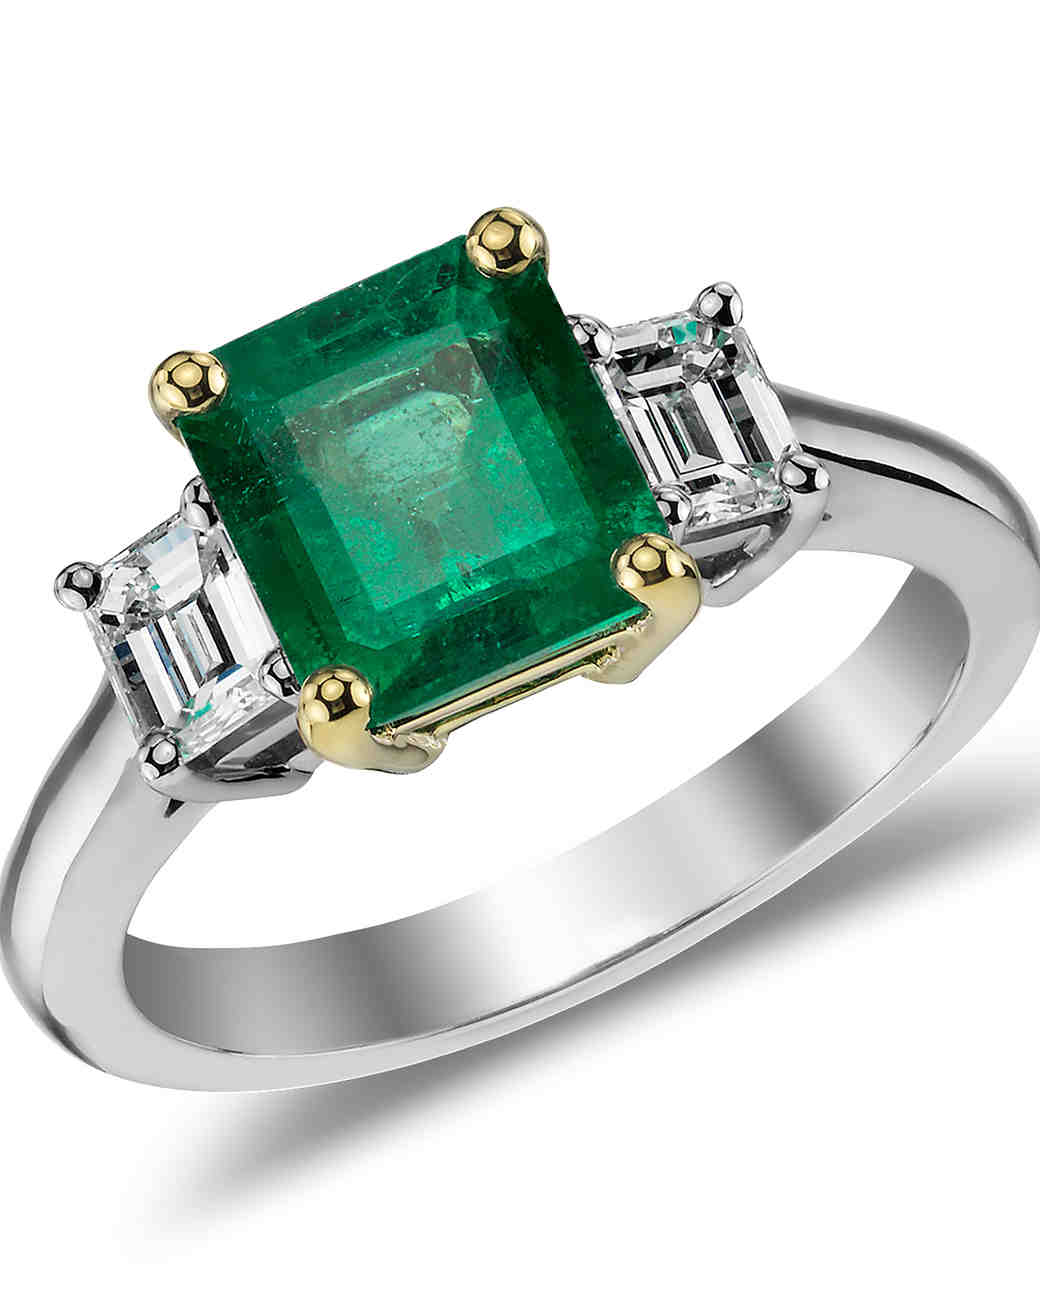 Emerald Engagement Rings For A Oneofakind Bride Martha Stewart Weddings: Green Lantern Emerald Wedding Band Set At Websimilar.org